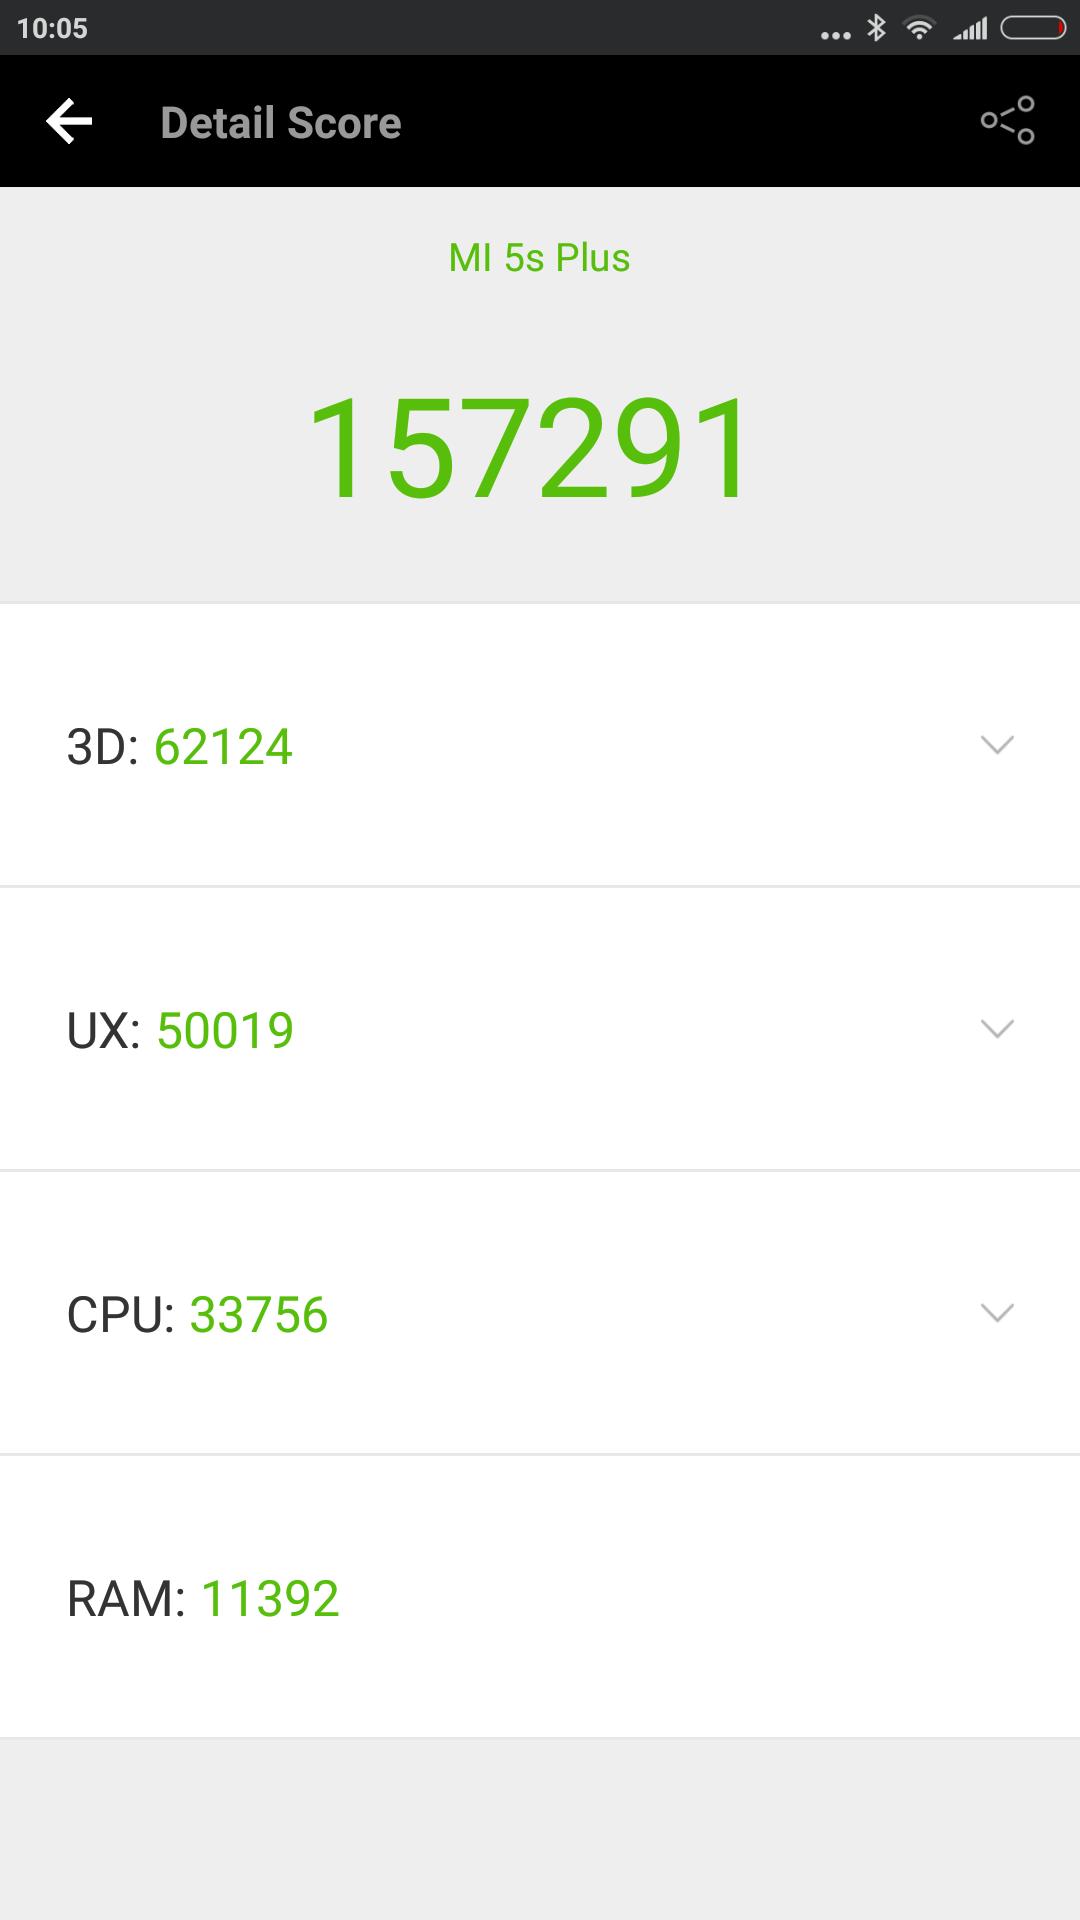 xiaomi-mi5s-plus-antutu-benchmark